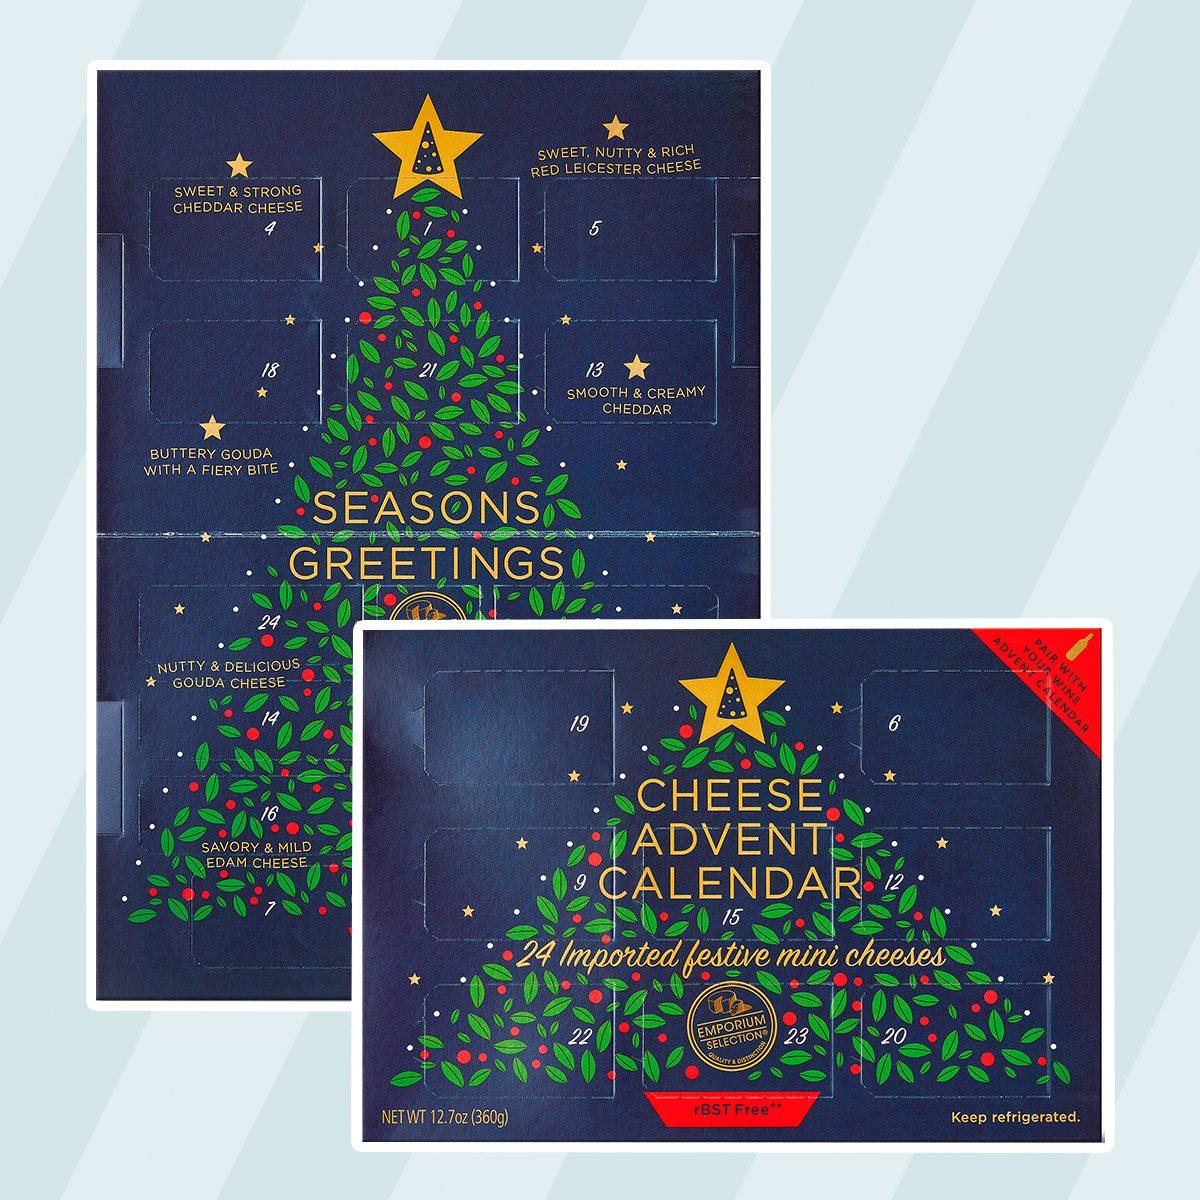 Cheese advent Calendar from Aldi